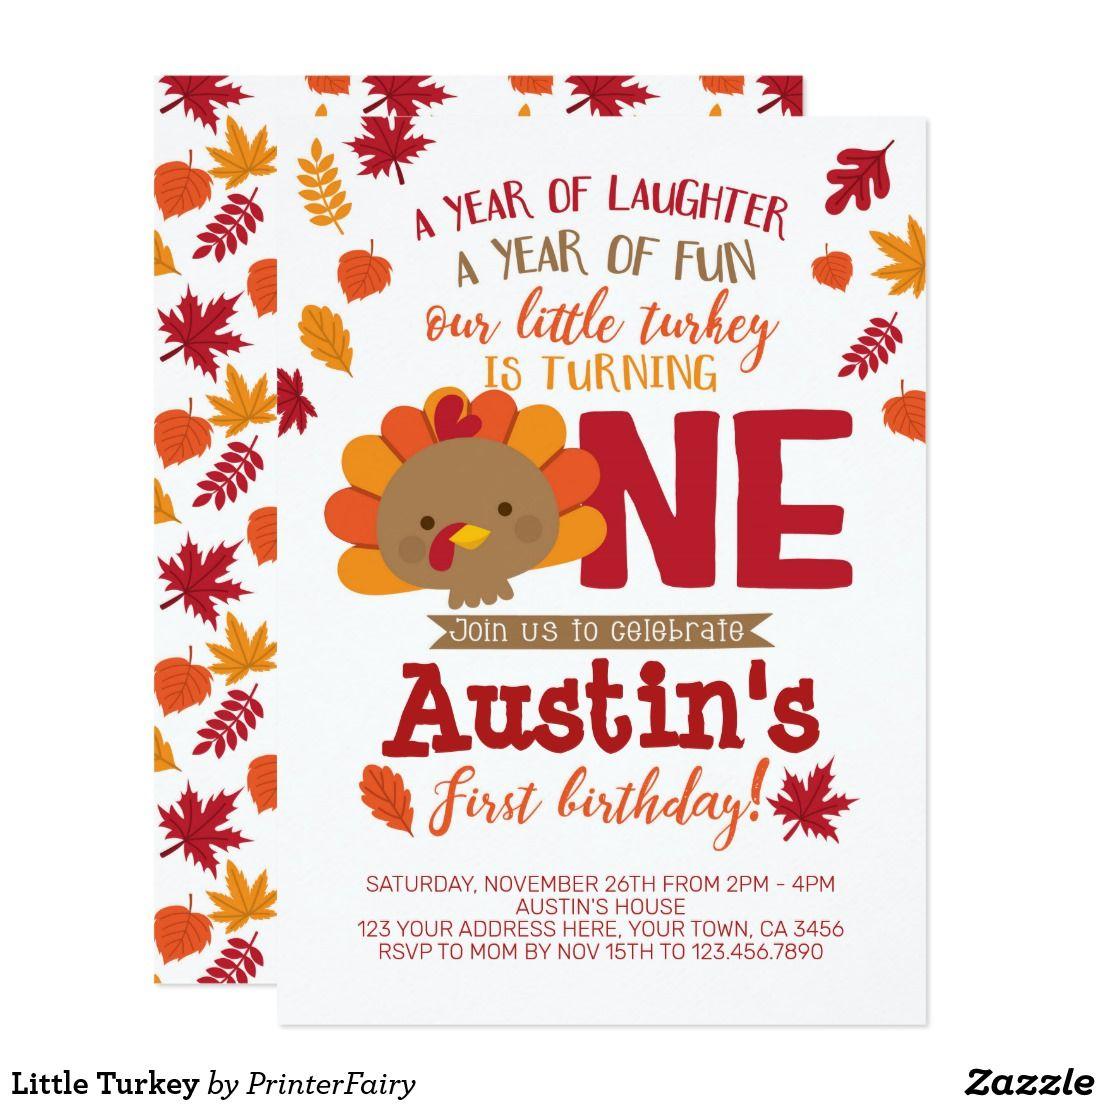 Little Turkey Invitation Zazzle Com In 2020 Thanksgiving Birthday Parties Turkey Birthday Party November Birthday Party